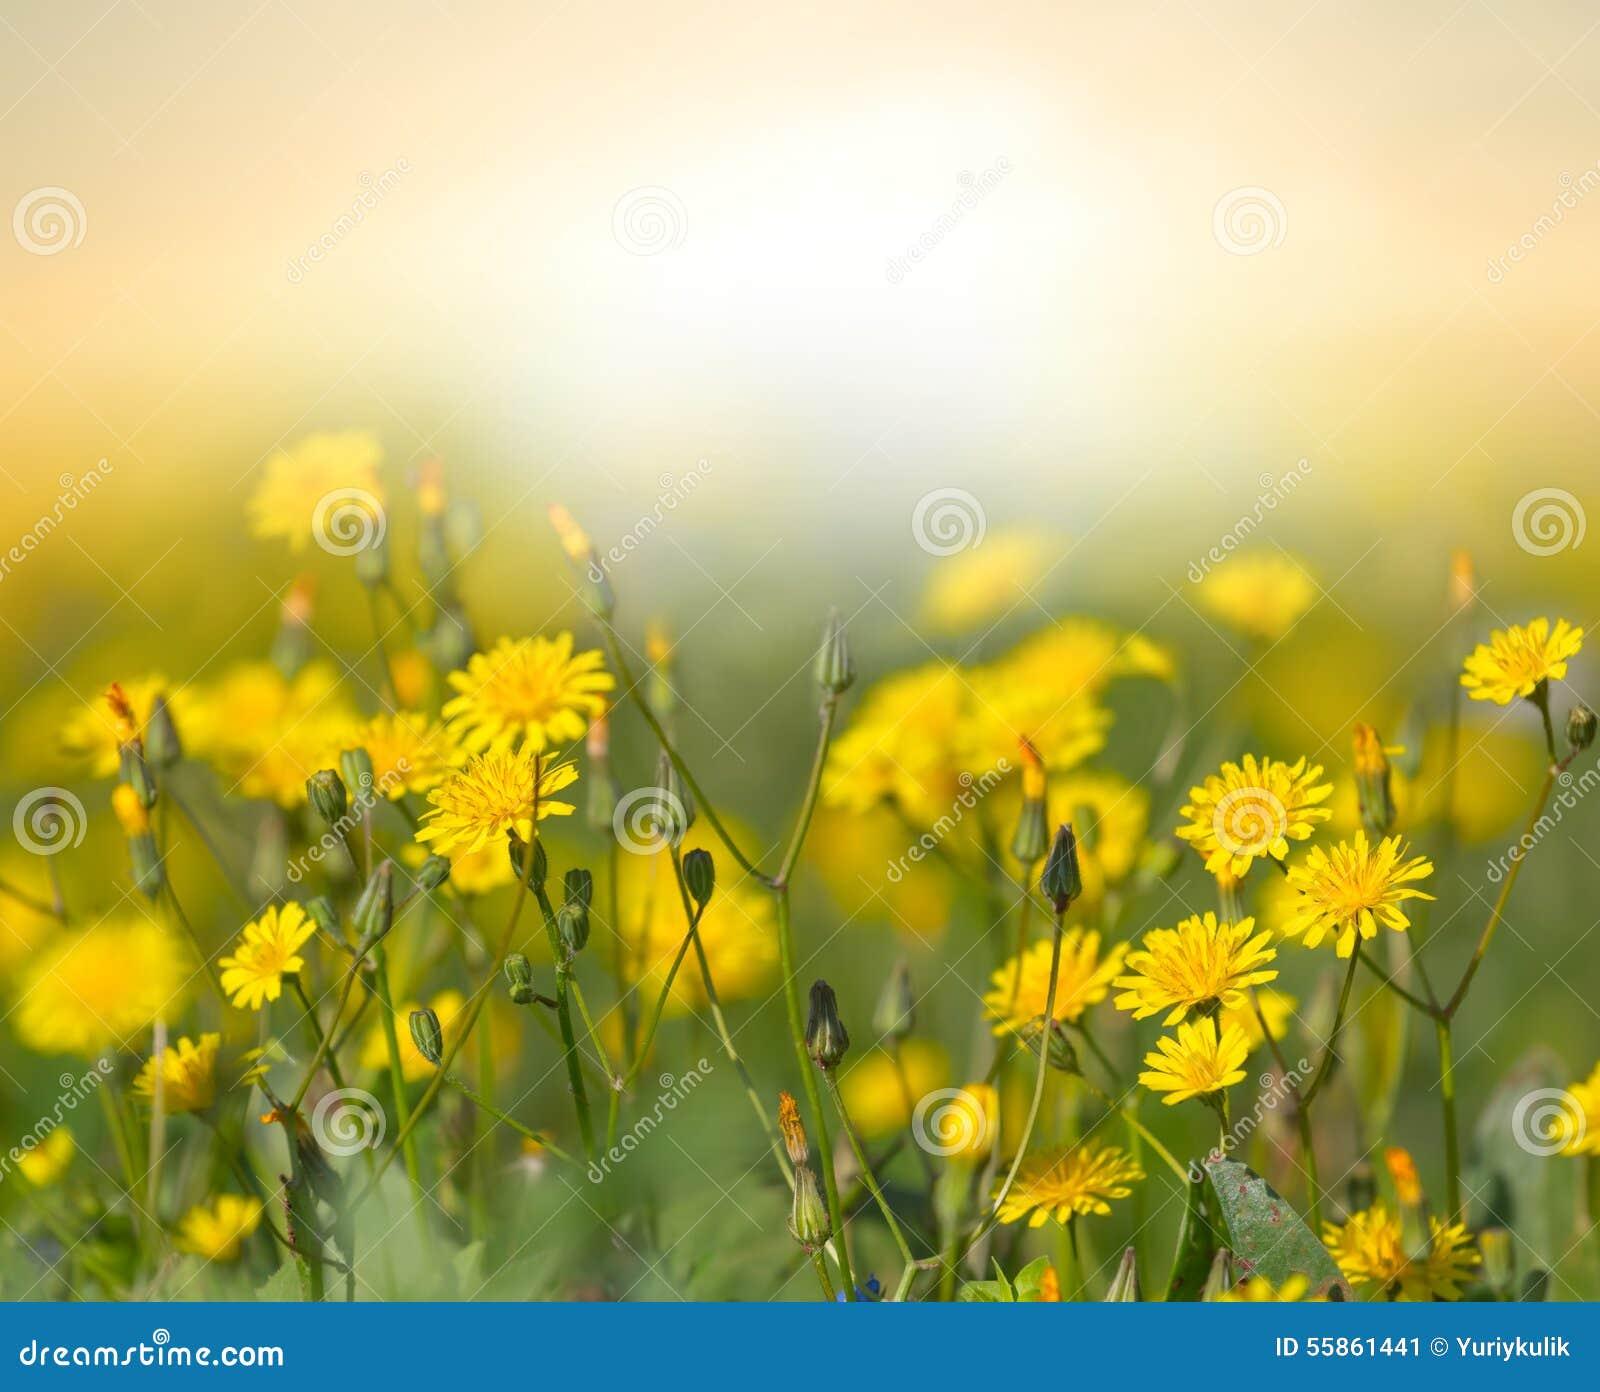 Yellow Prairie Flowers Stock Image Image Of Closeup 55861441